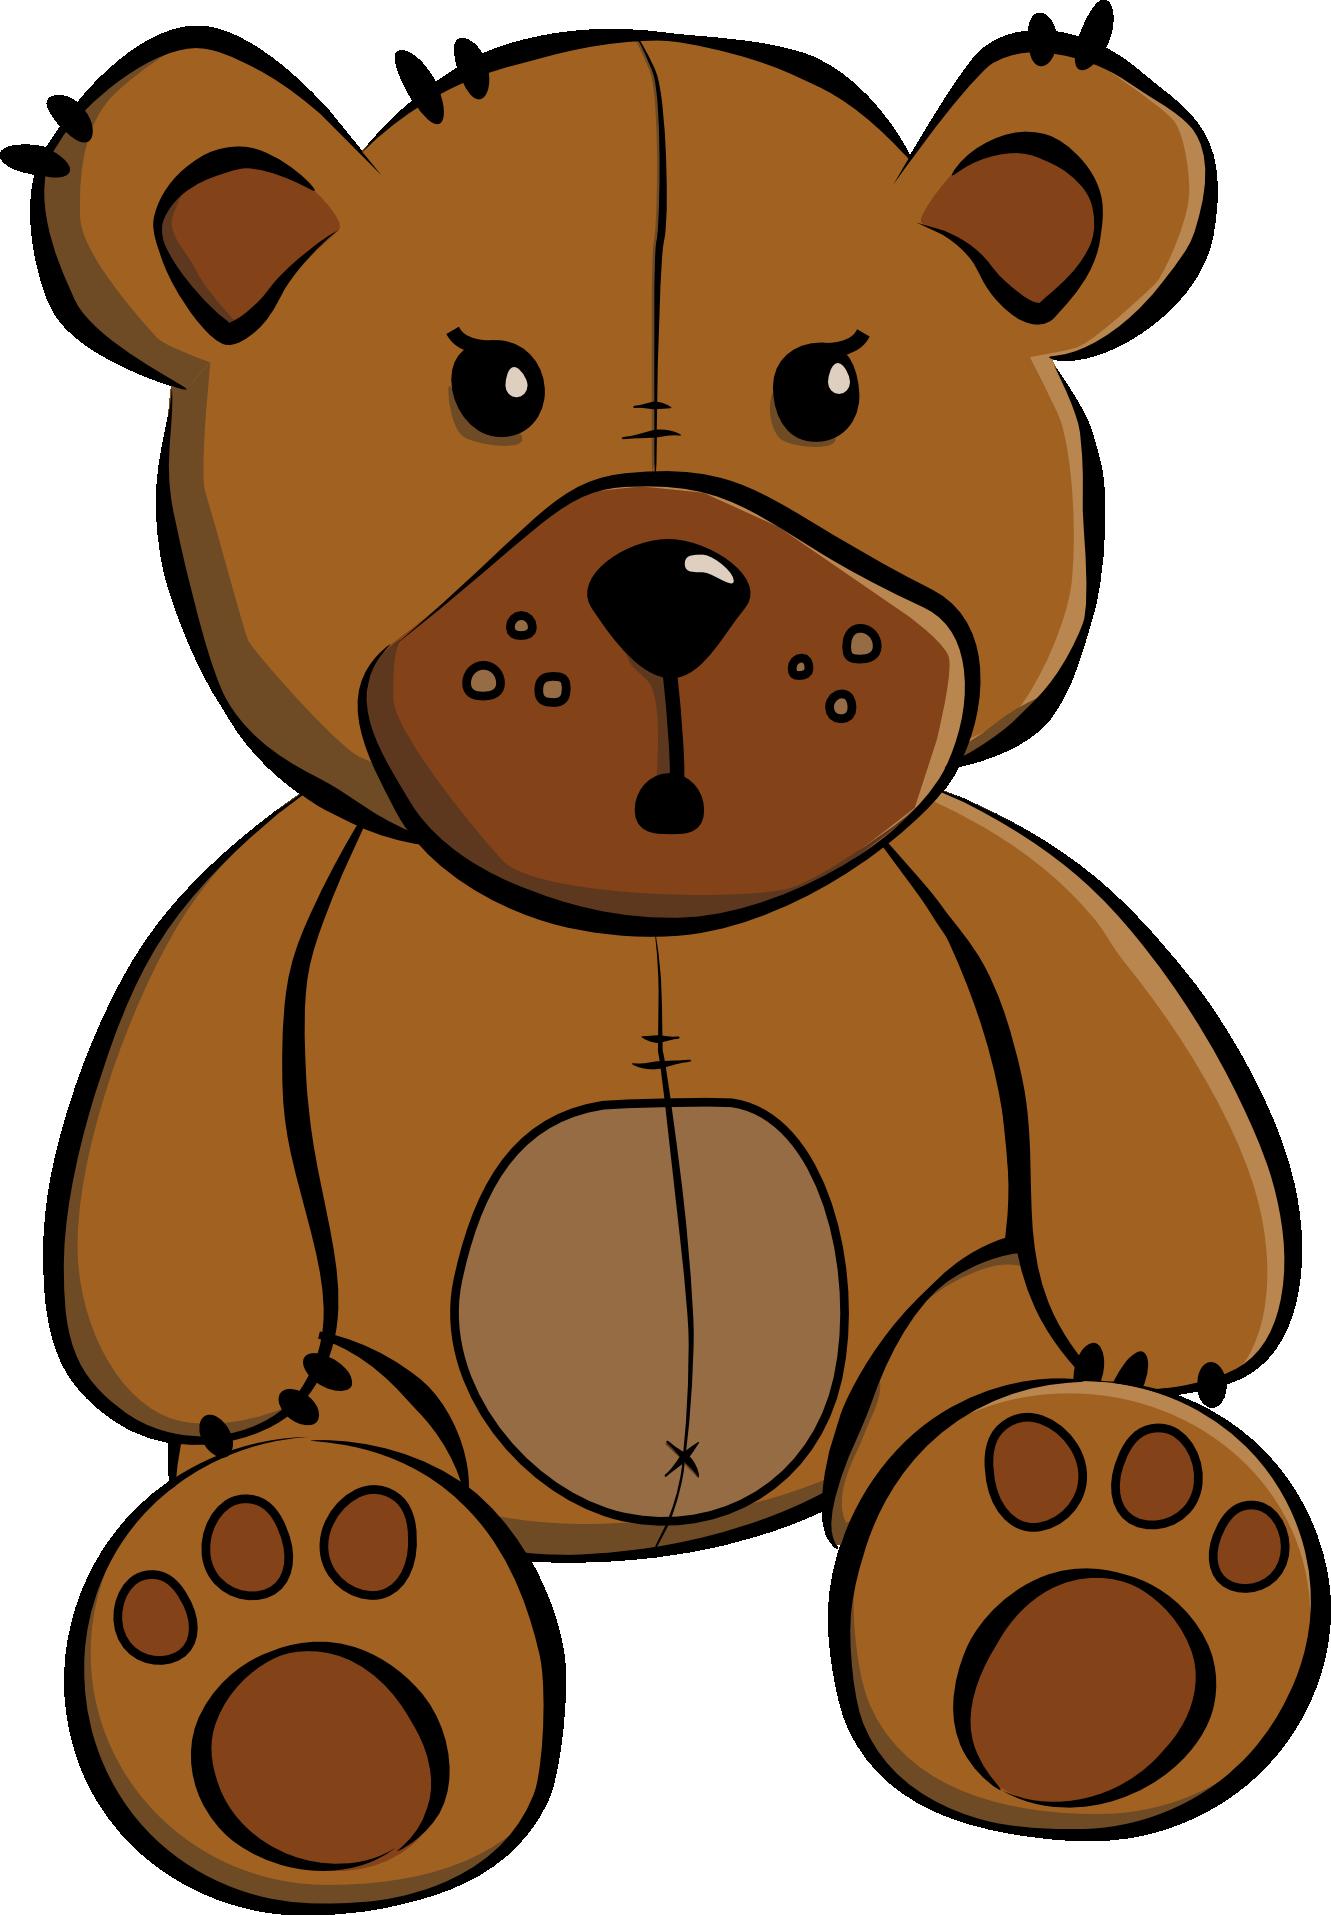 1331x1915 Clip Art Cartoon Teddy Bear Redonkulous Clipart